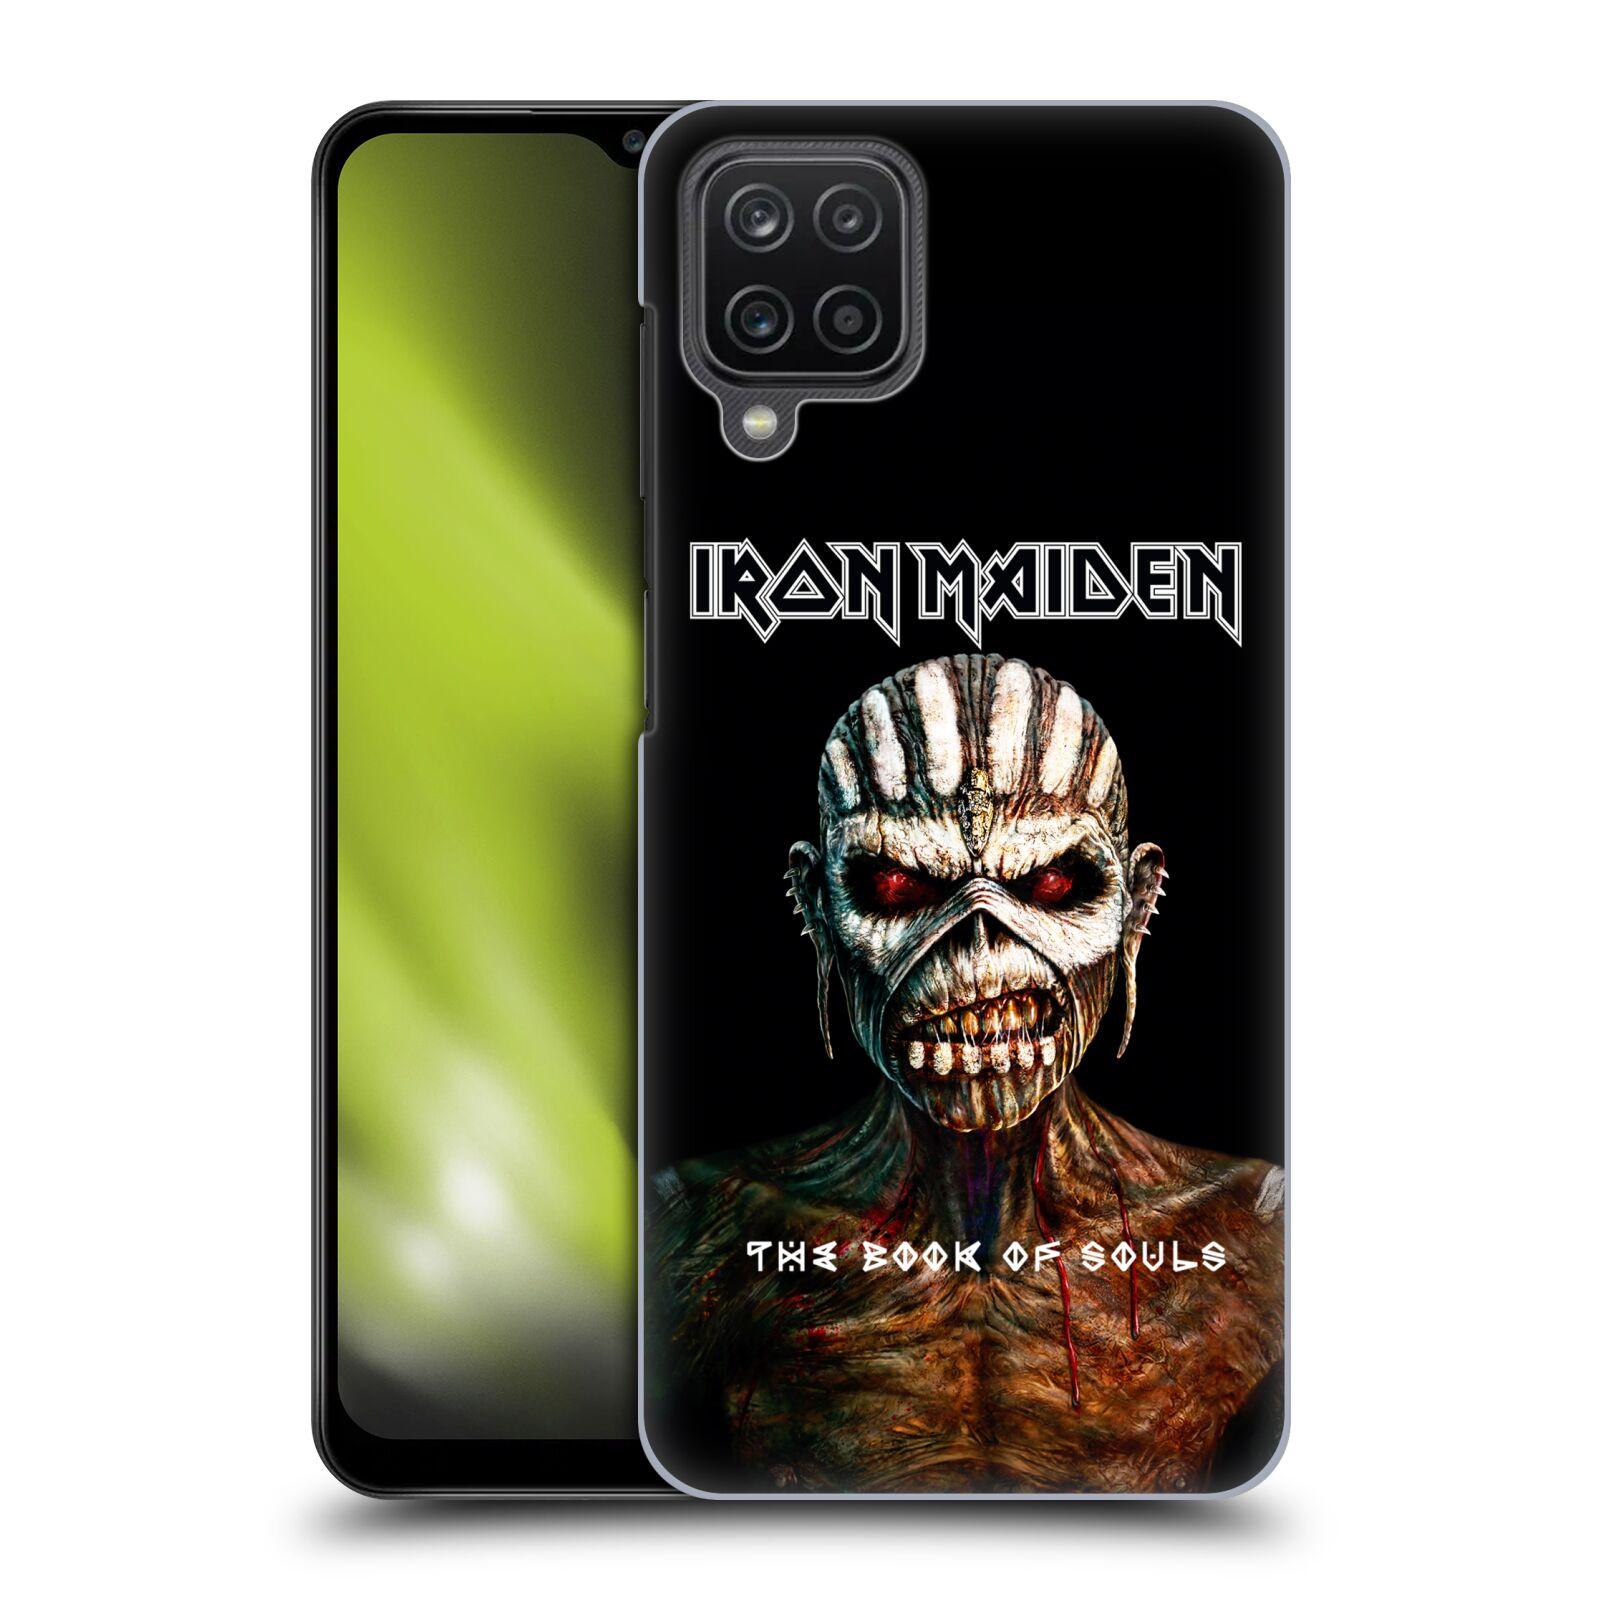 Plastové pouzdro na mobil Samsung Galaxy A12 - Head Case - Iron Maiden - The Book Of Souls